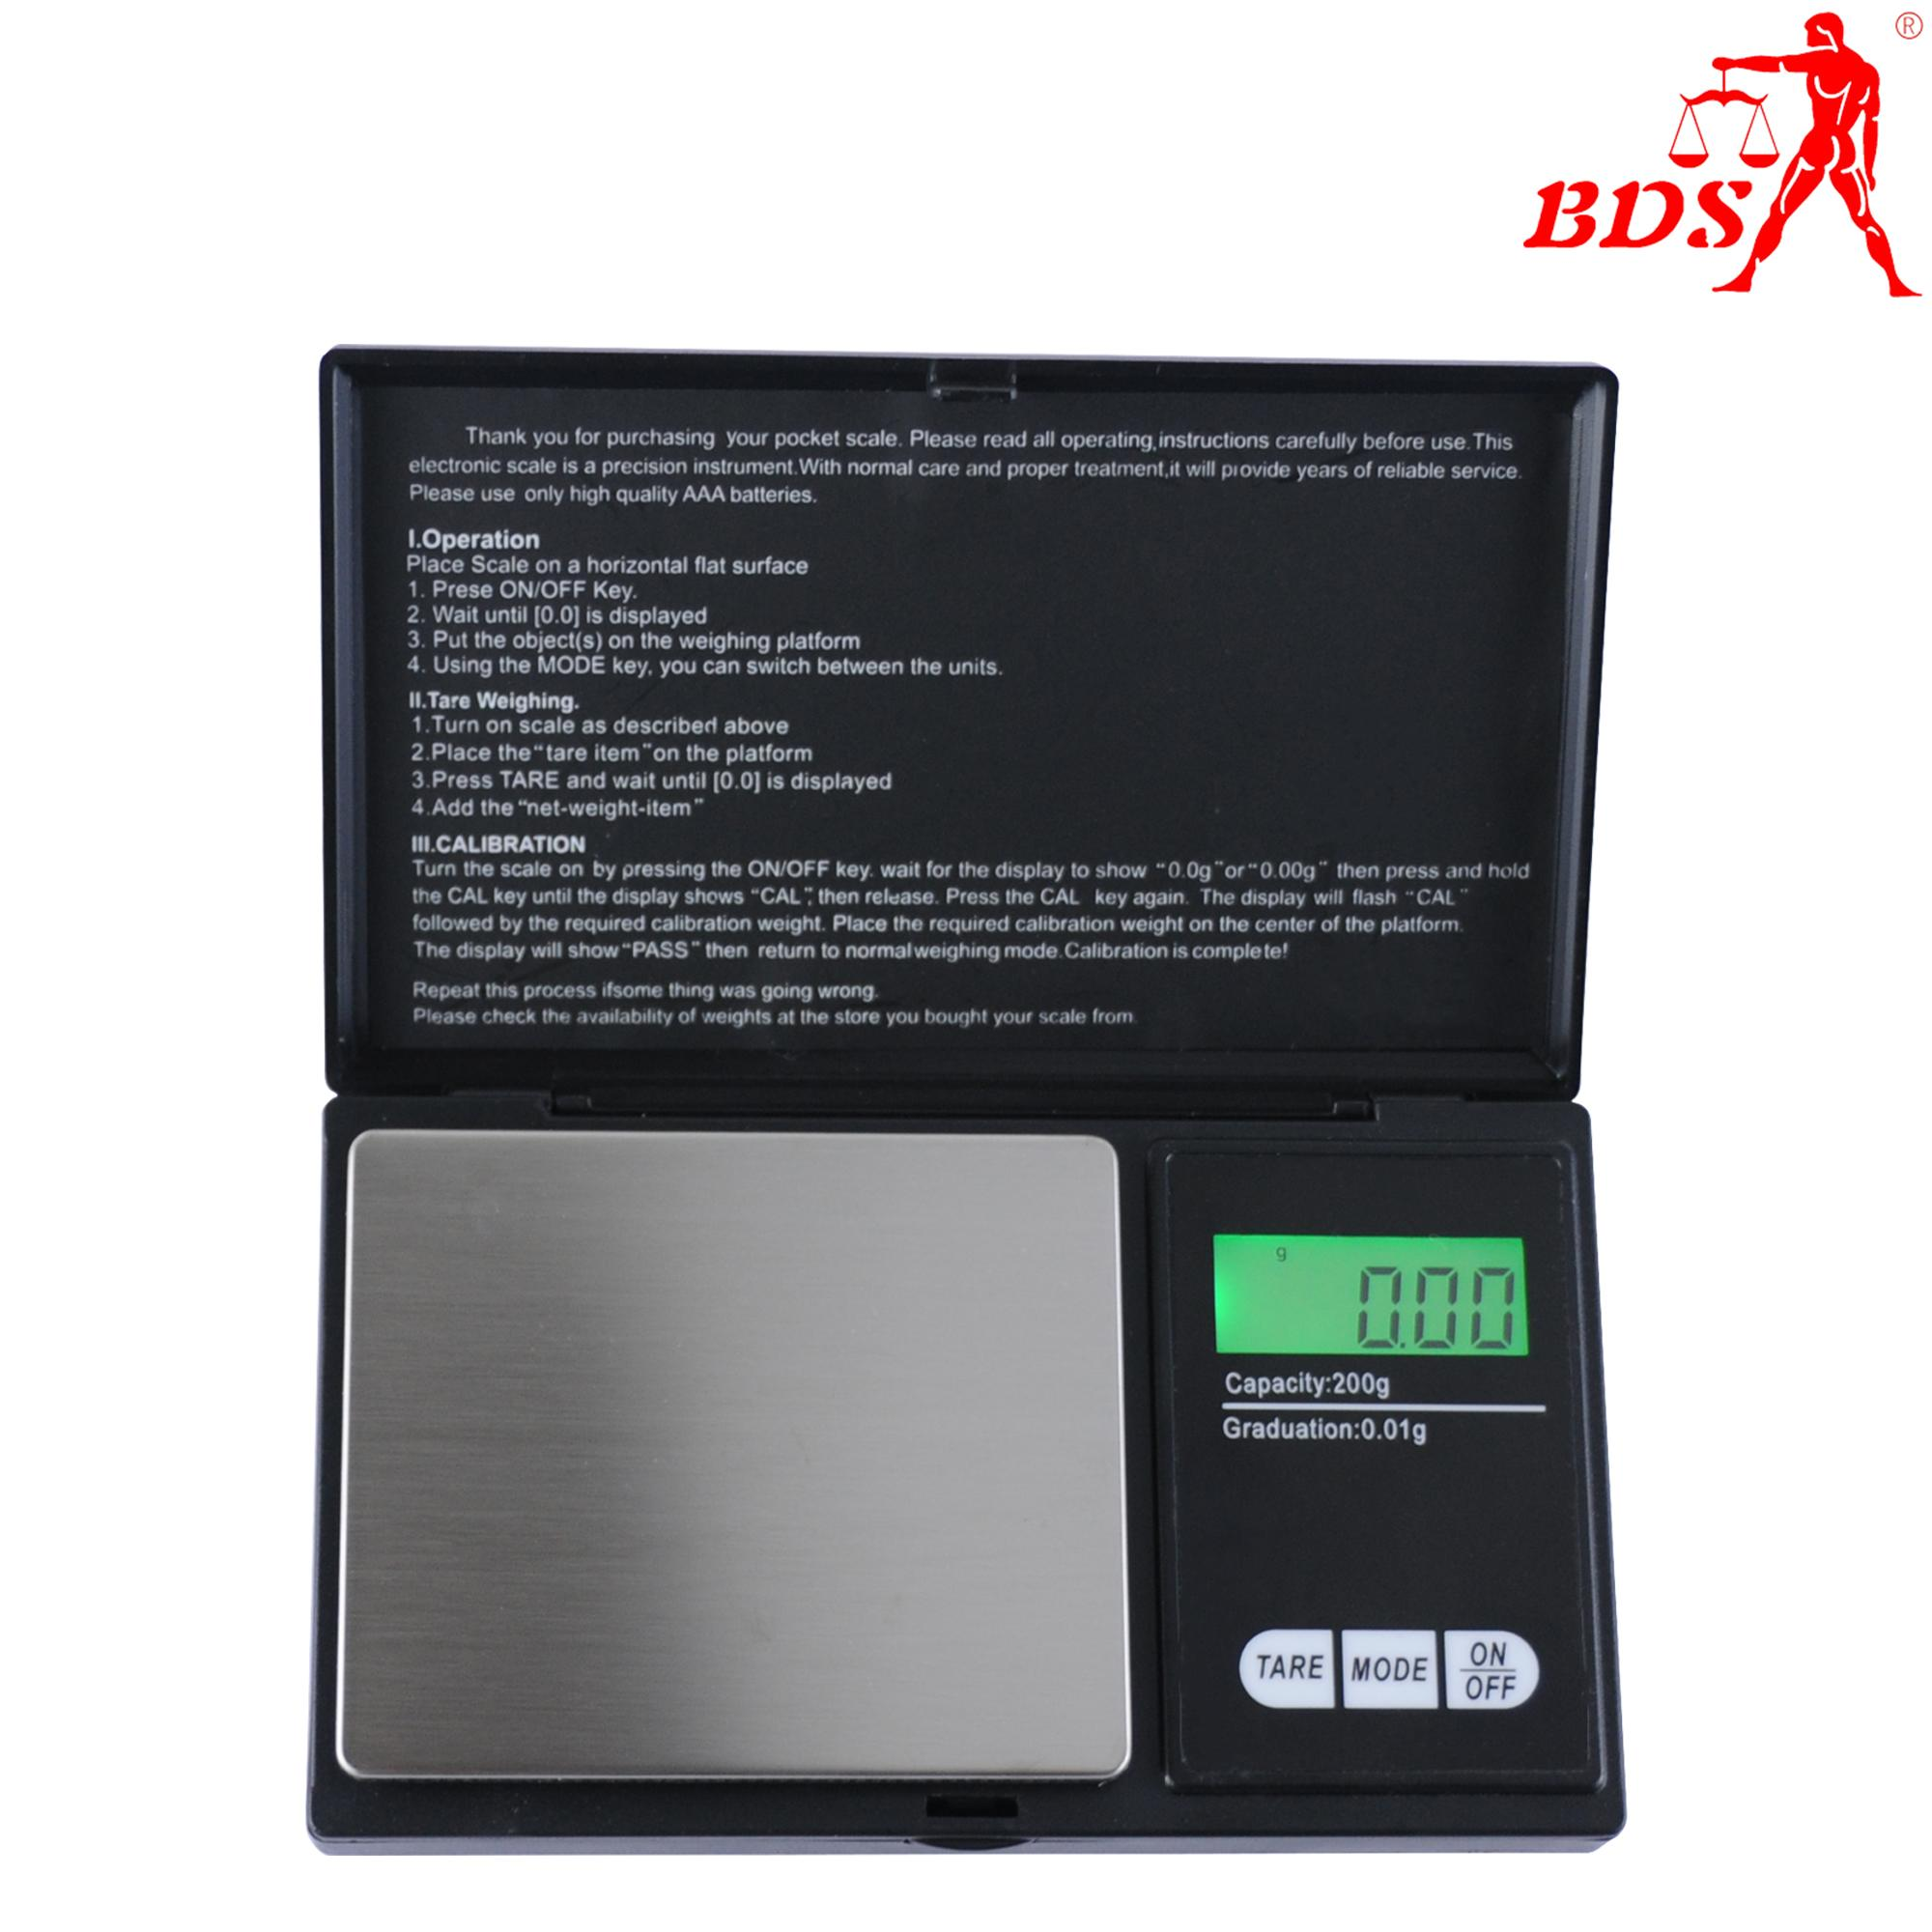 BDS CS Mini Pocket Scale Weight  Digital Scale CS Series manufacturer  1